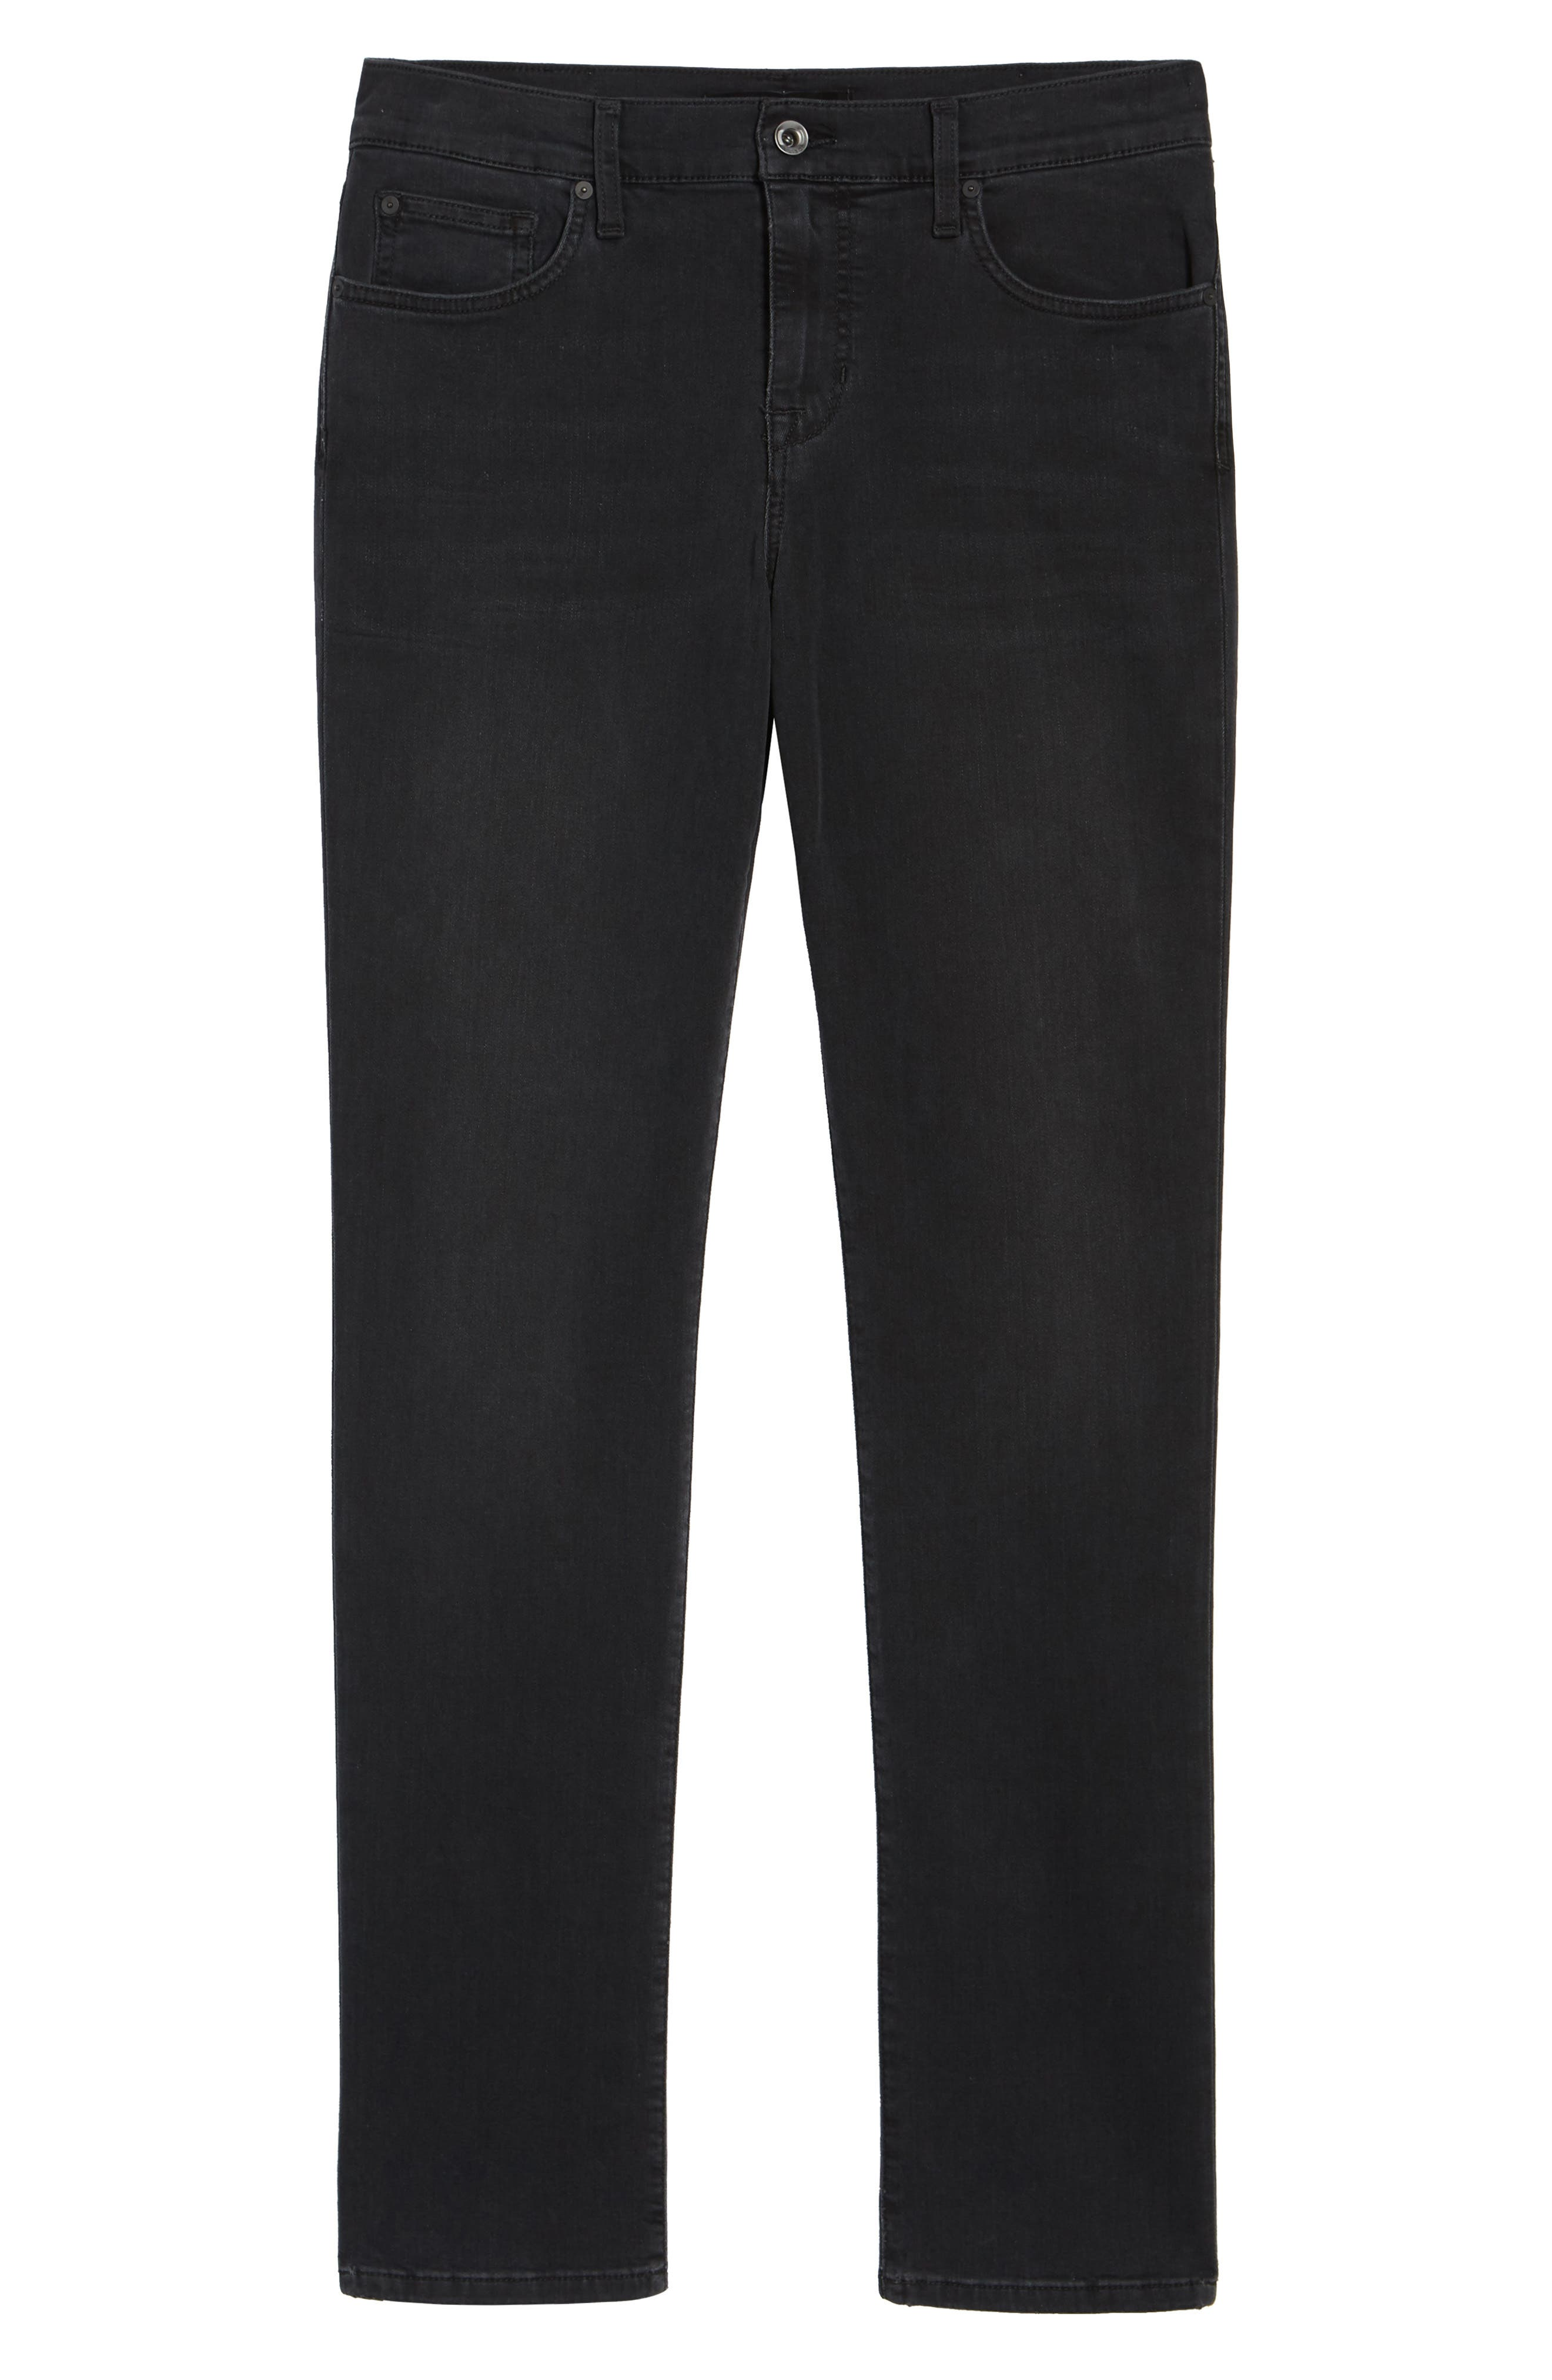 Slim Fit Jeans,                             Alternate thumbnail 6, color,                             Beldon